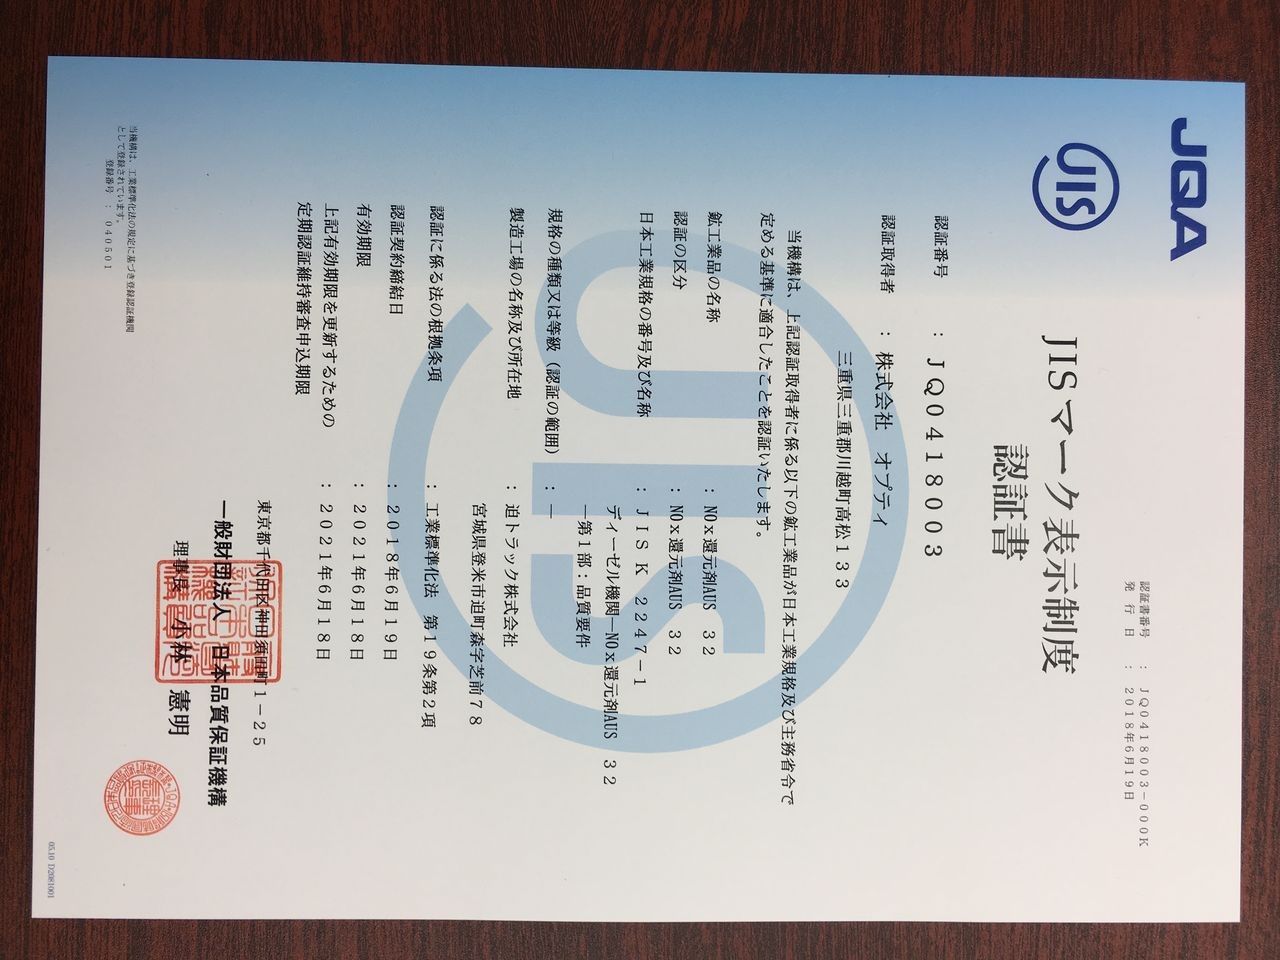 9659BCEF-56BE-490D-80D4-70AC6281925A